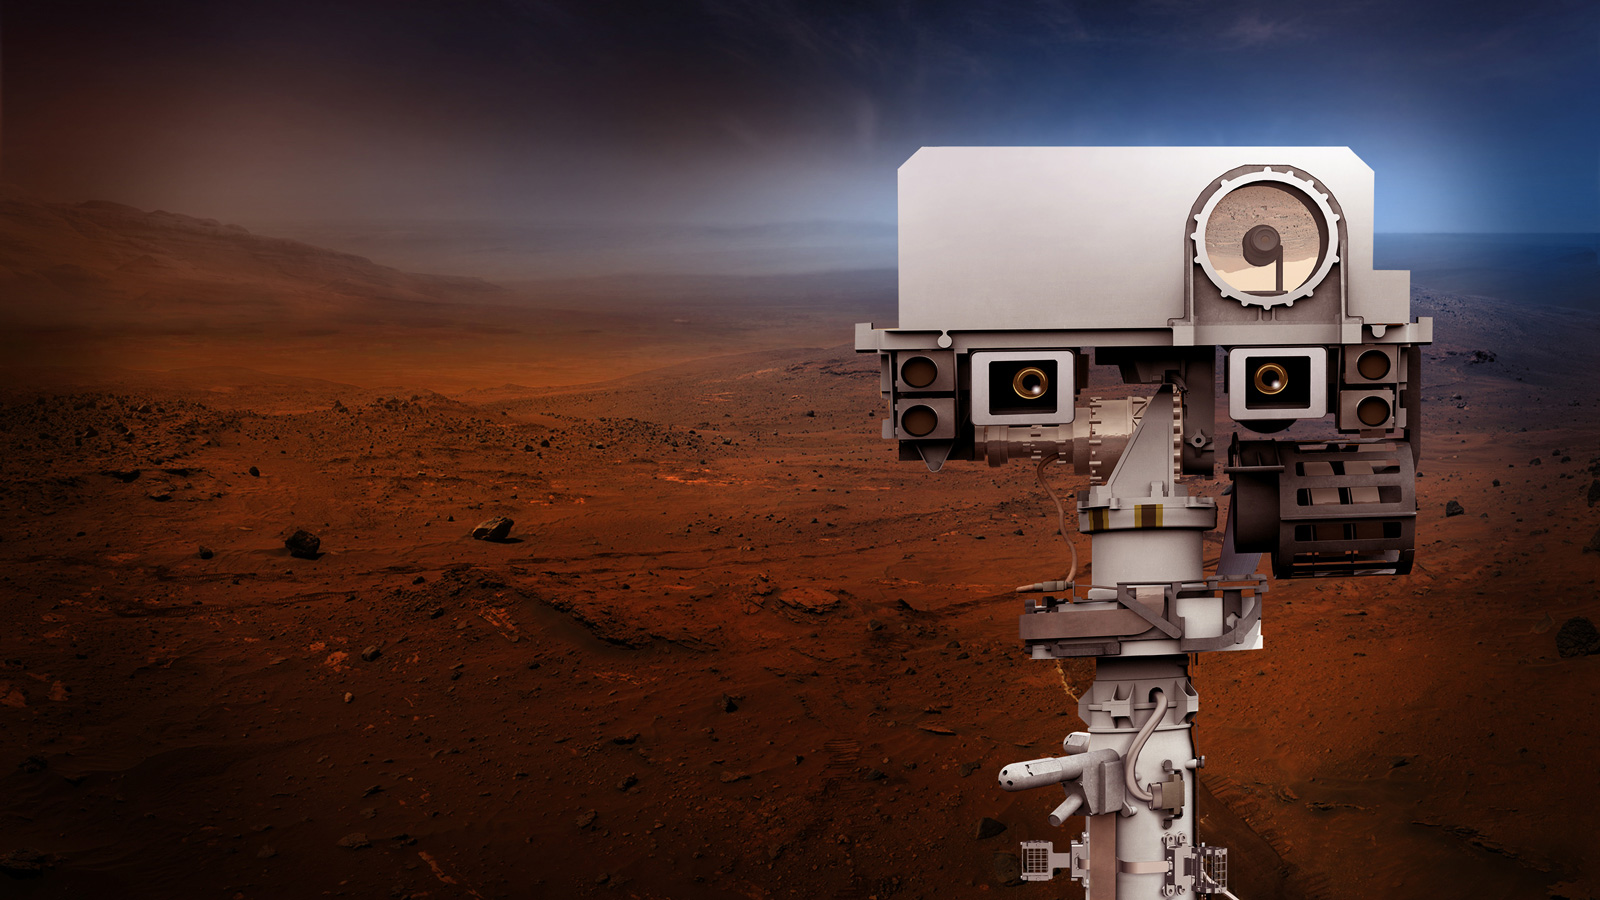 nasa-wants-kids-to-name-2020-rover